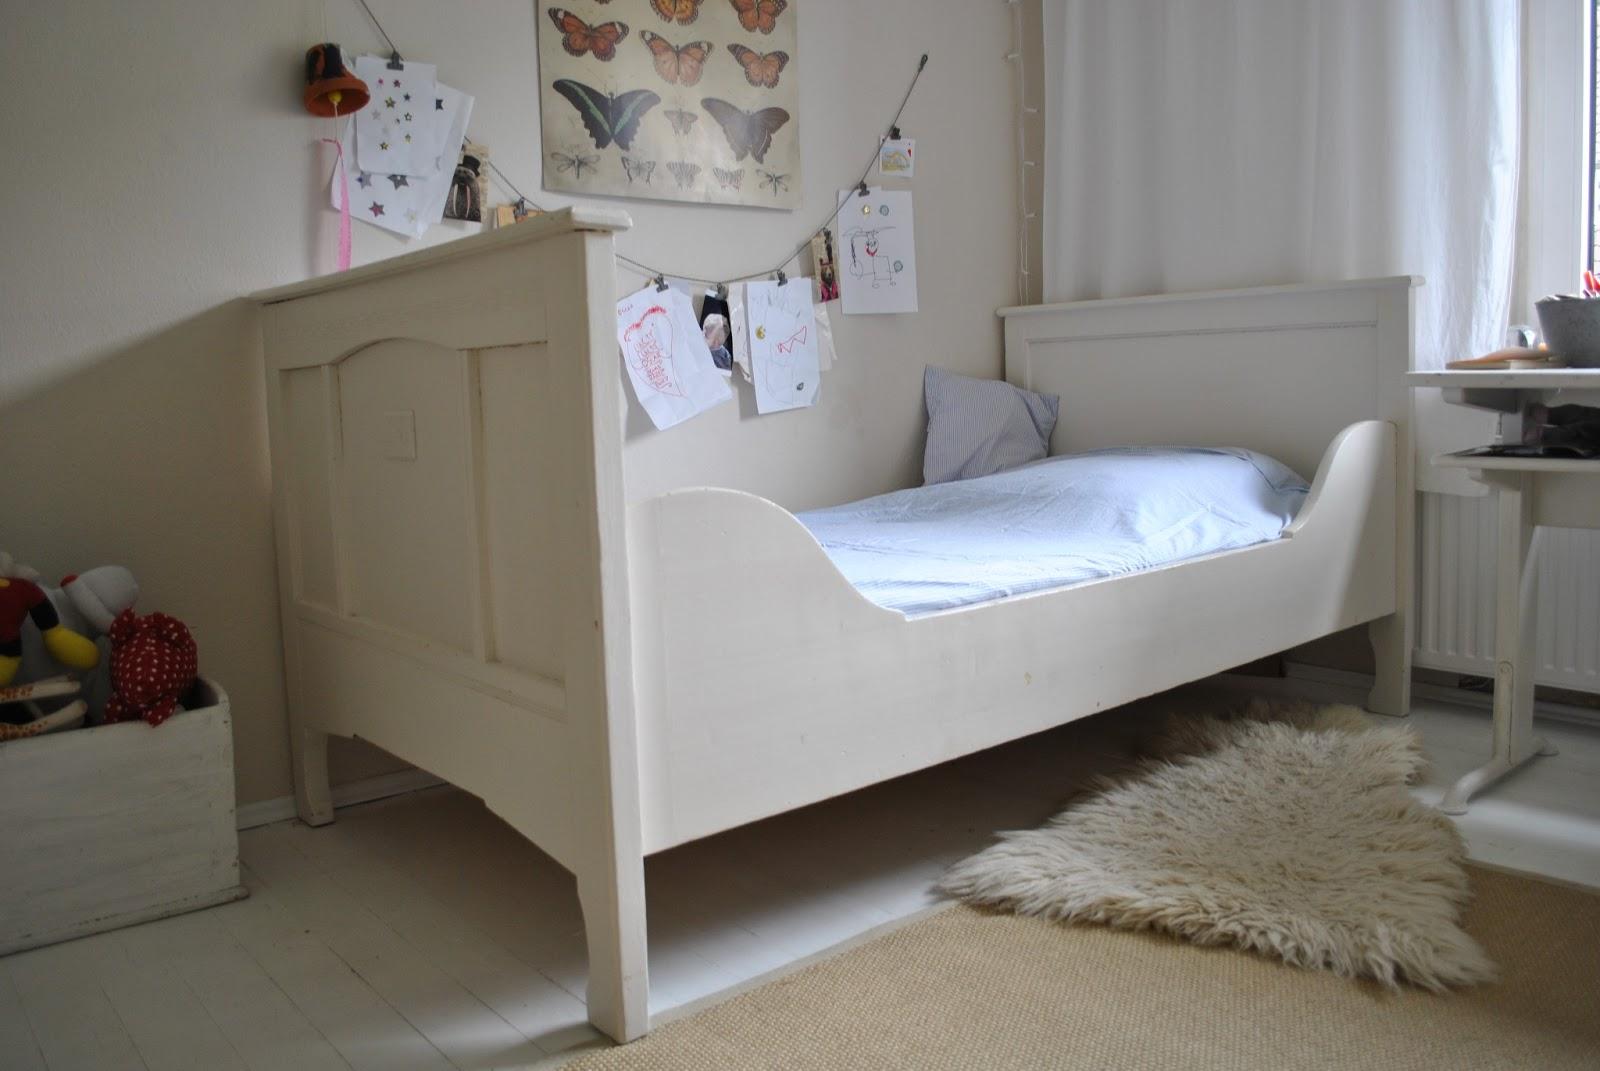 country homestyles alles was mein herz begehrt. Black Bedroom Furniture Sets. Home Design Ideas